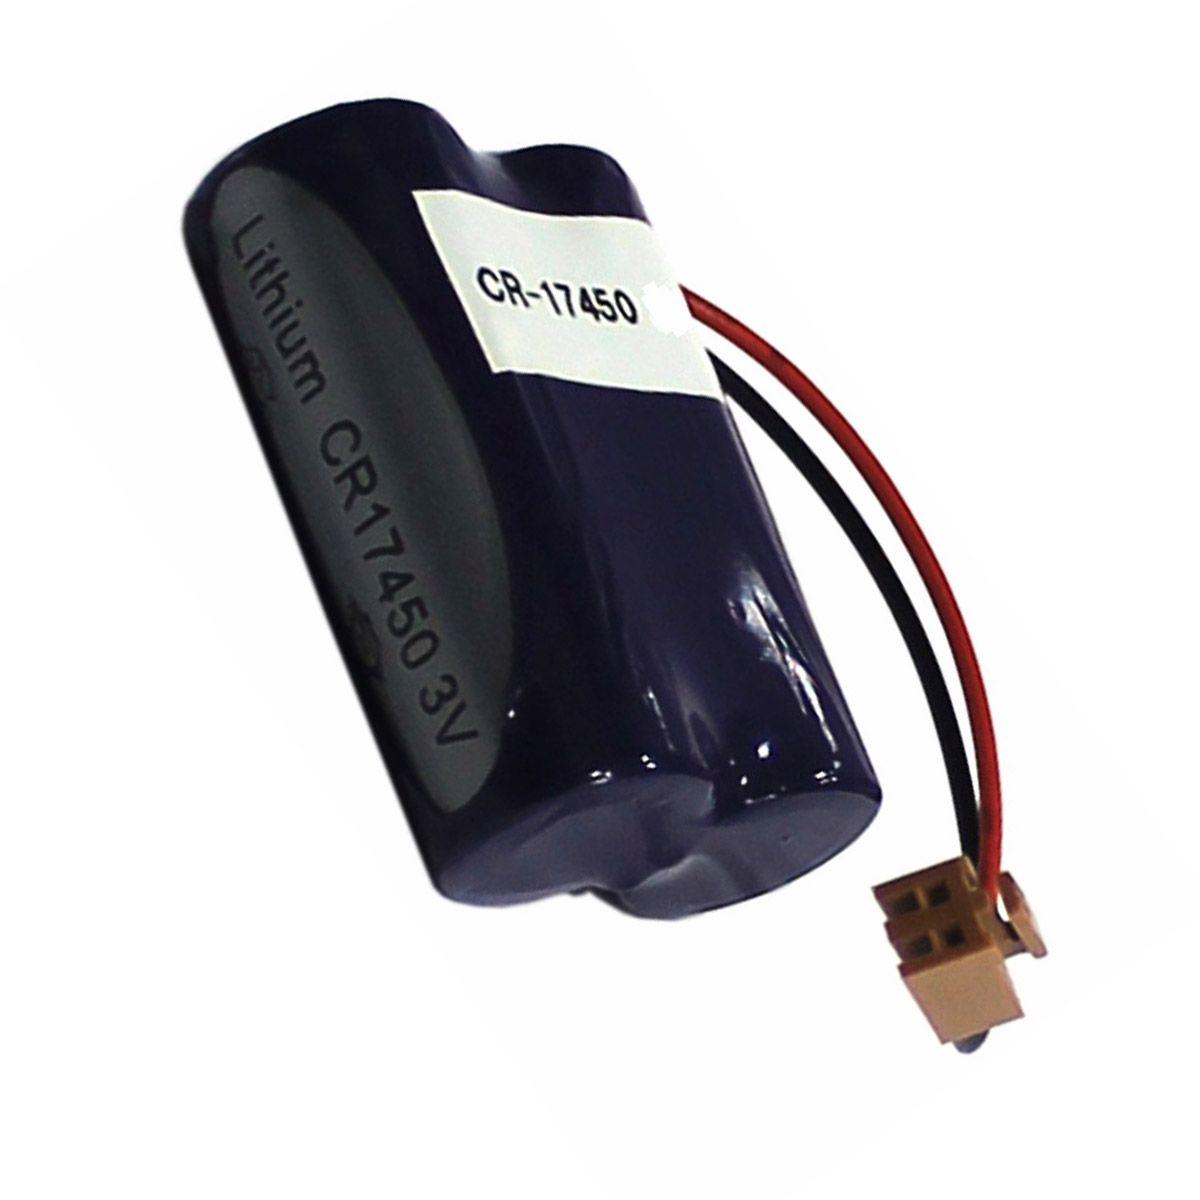 BATERIA PLANET BATTERY CR17450 3V PARALELO LITHIUM 2xCR17450 PLC Lithium Battery